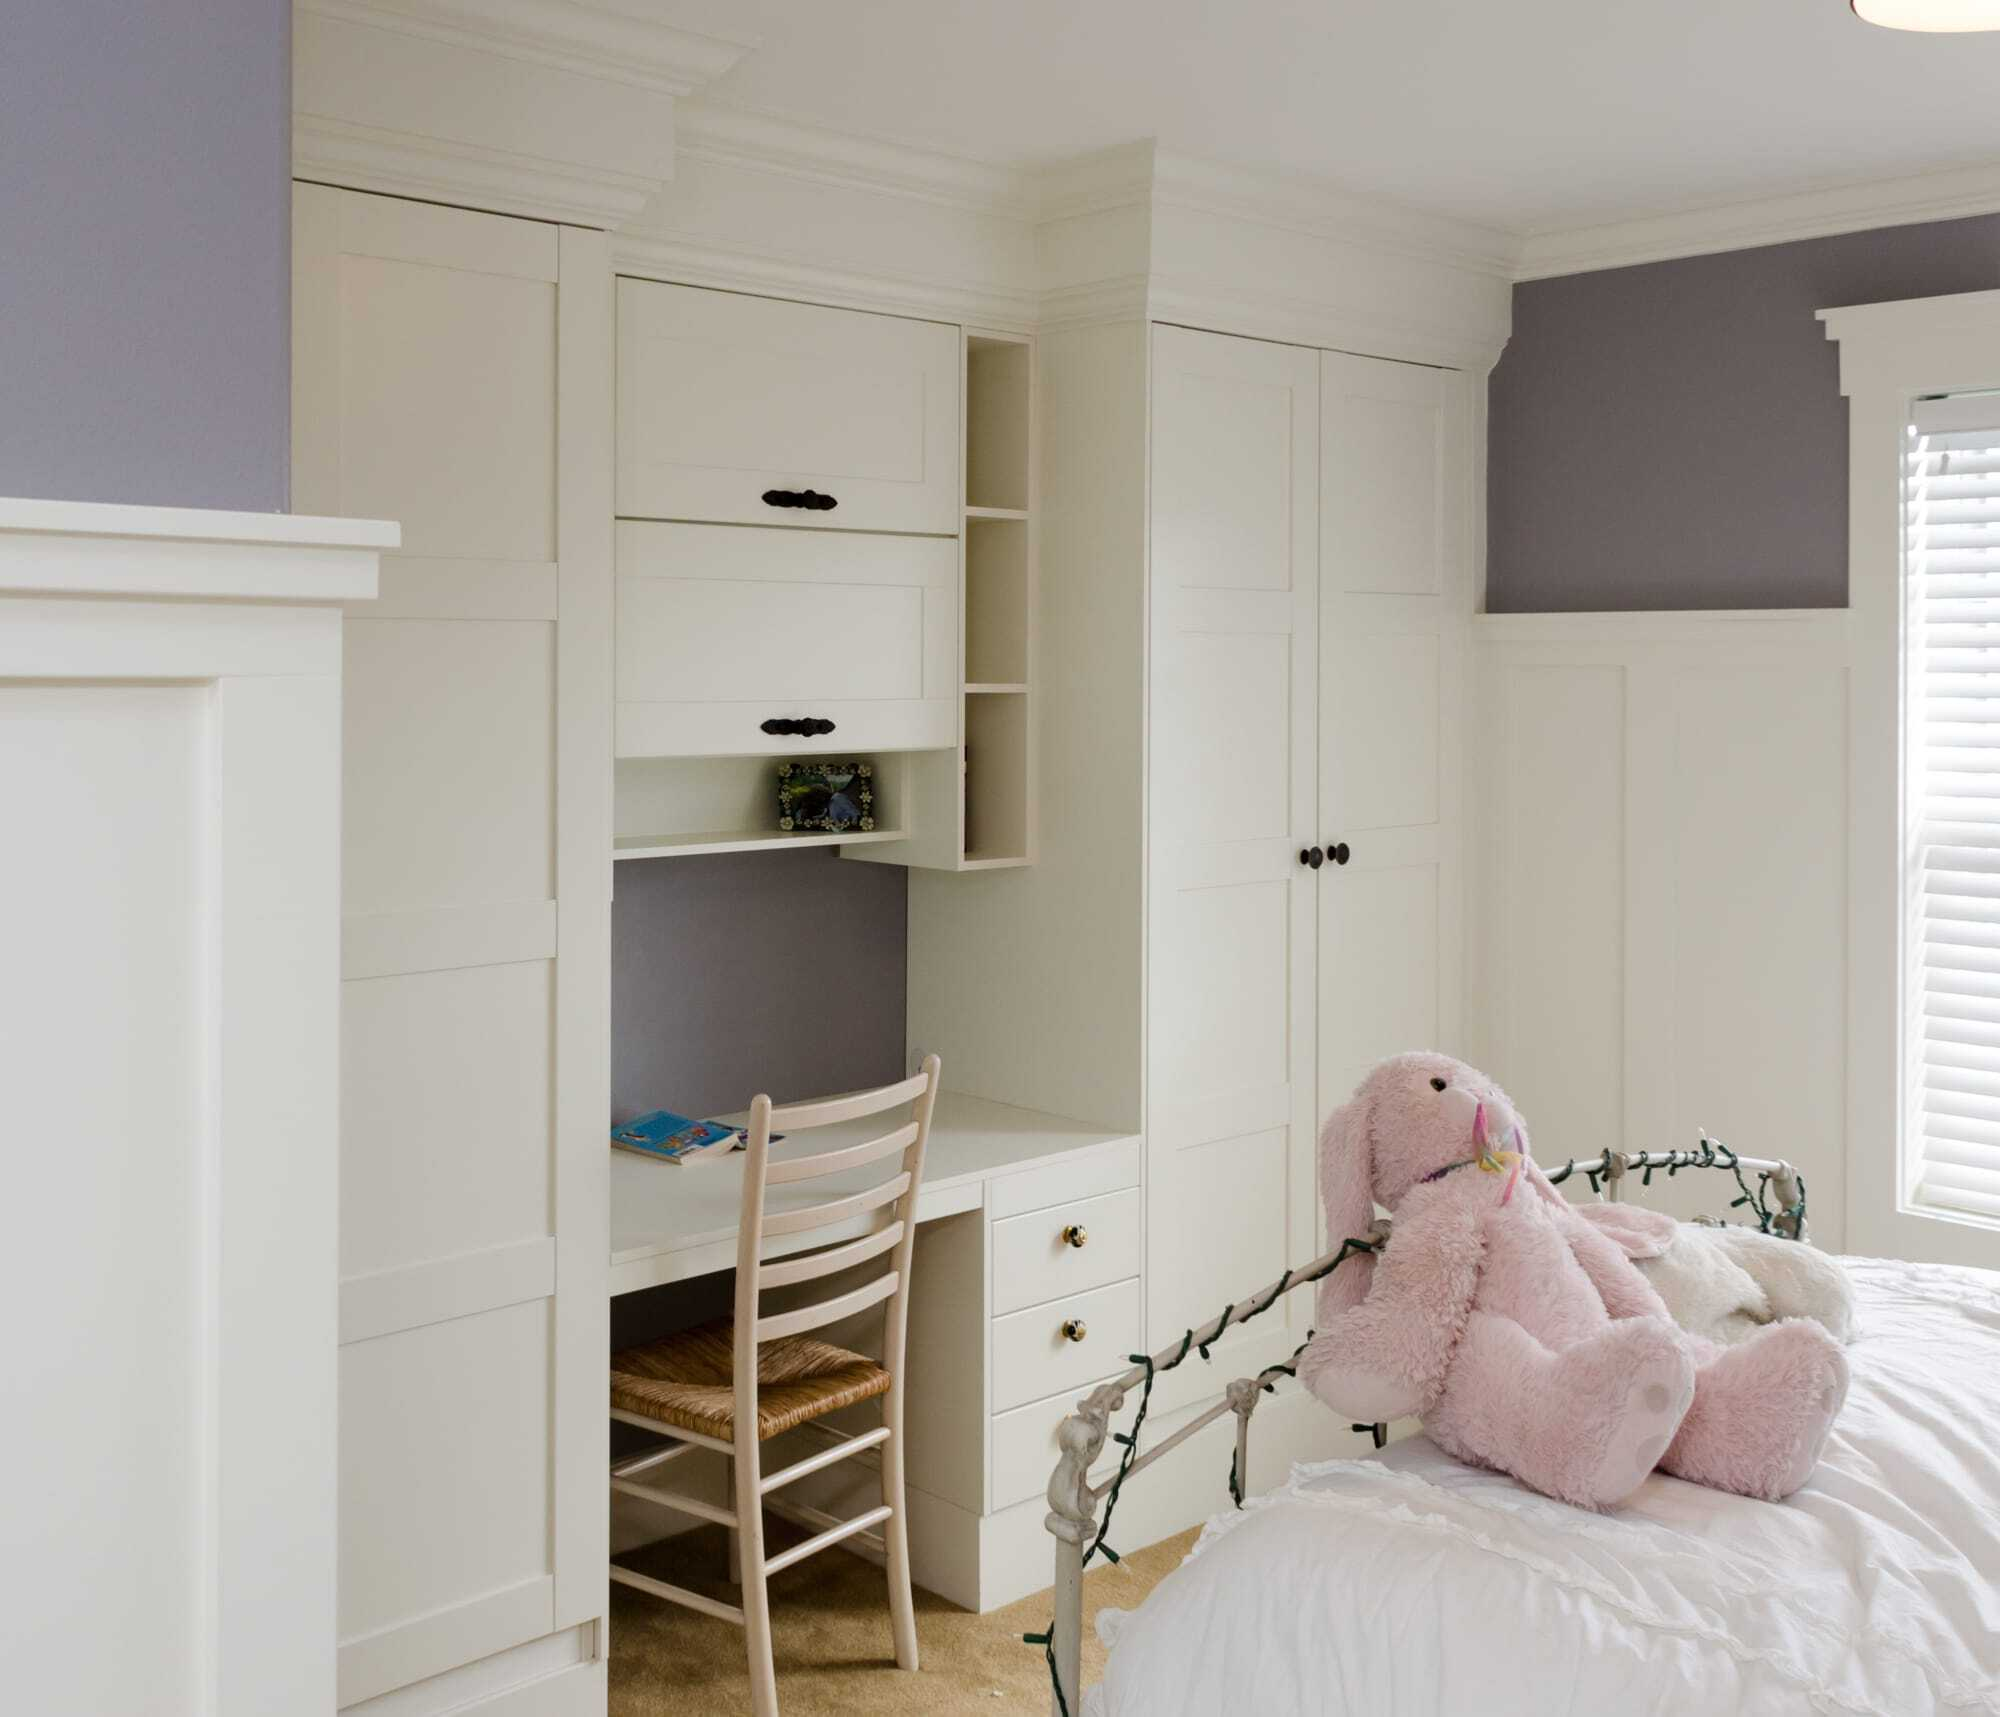 Ikea custom wardrobe door : ikea bagno lavelli. ikea accessori ...